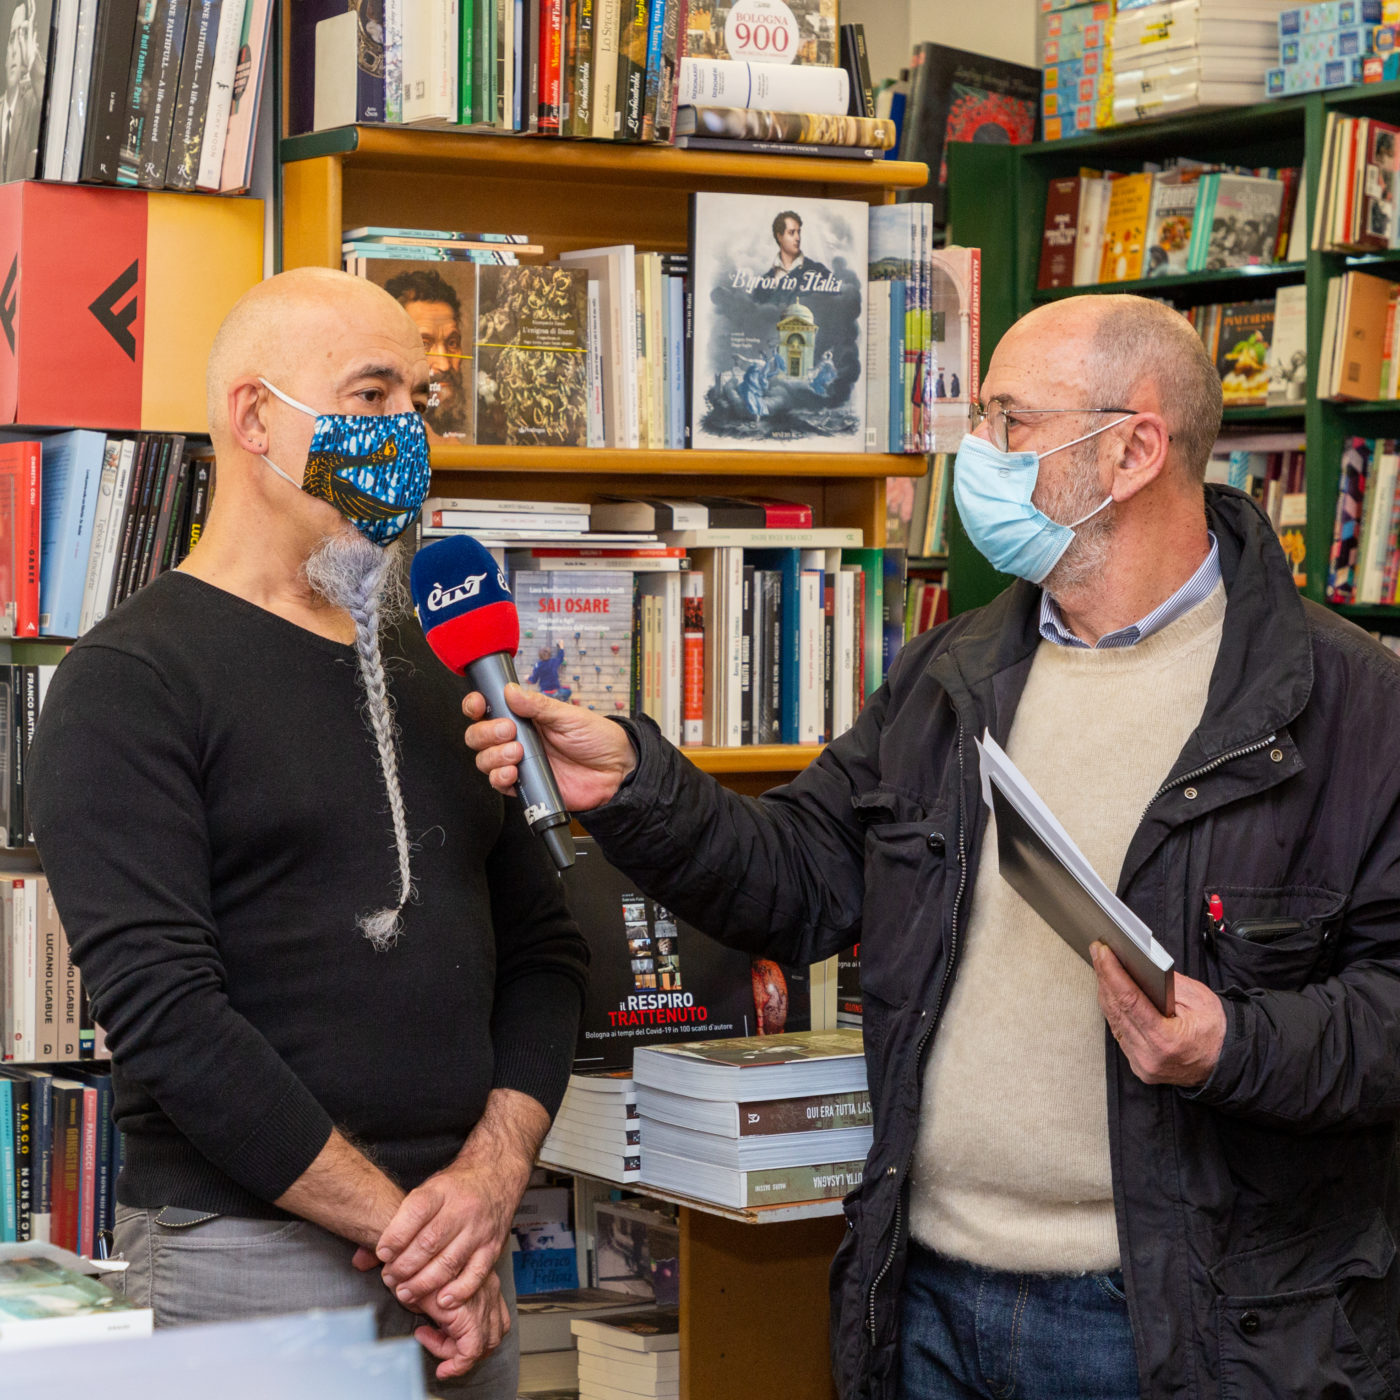 intervista éTV